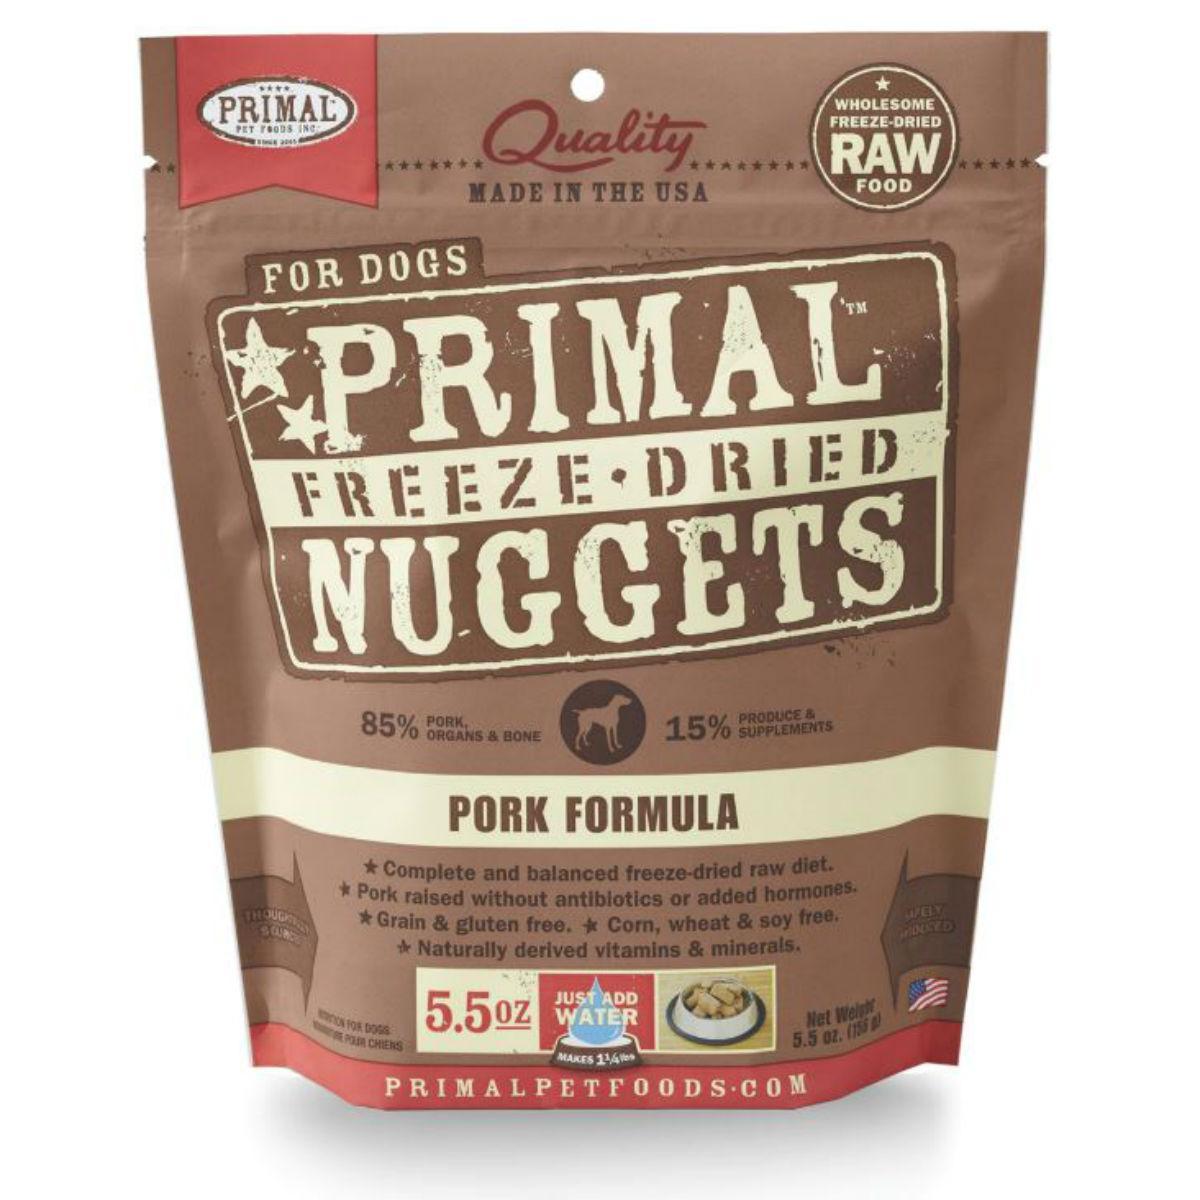 Primal Canine Freeze Dried Nuggets Dog Treat - Pork